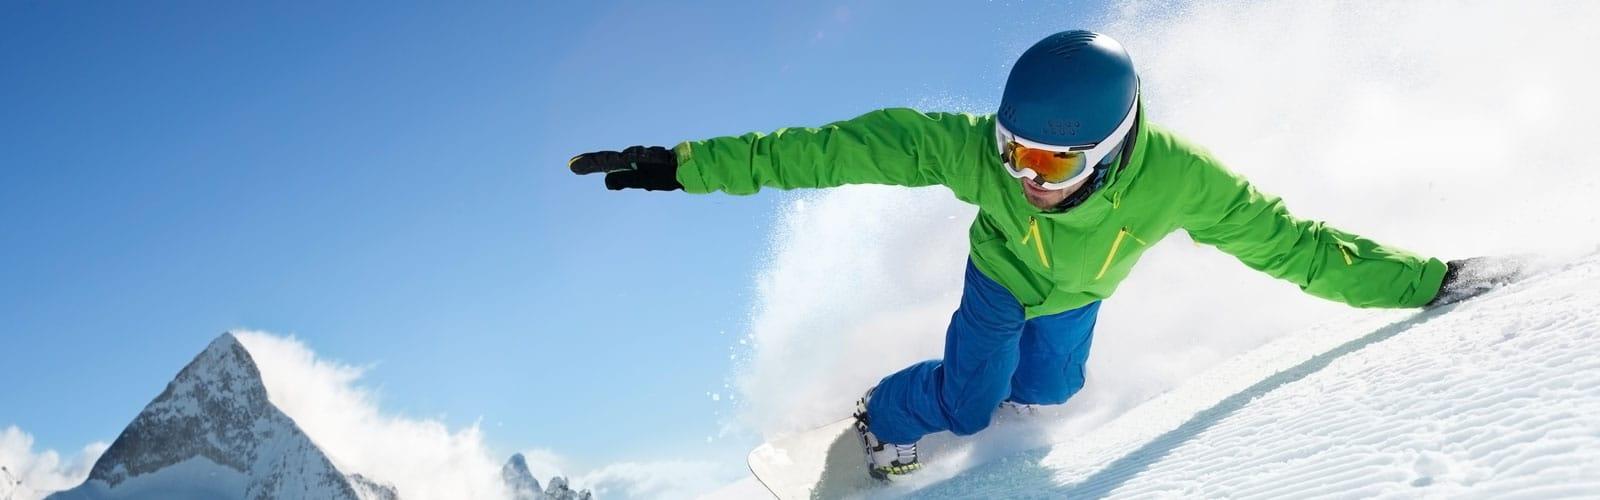 Snowboard Size